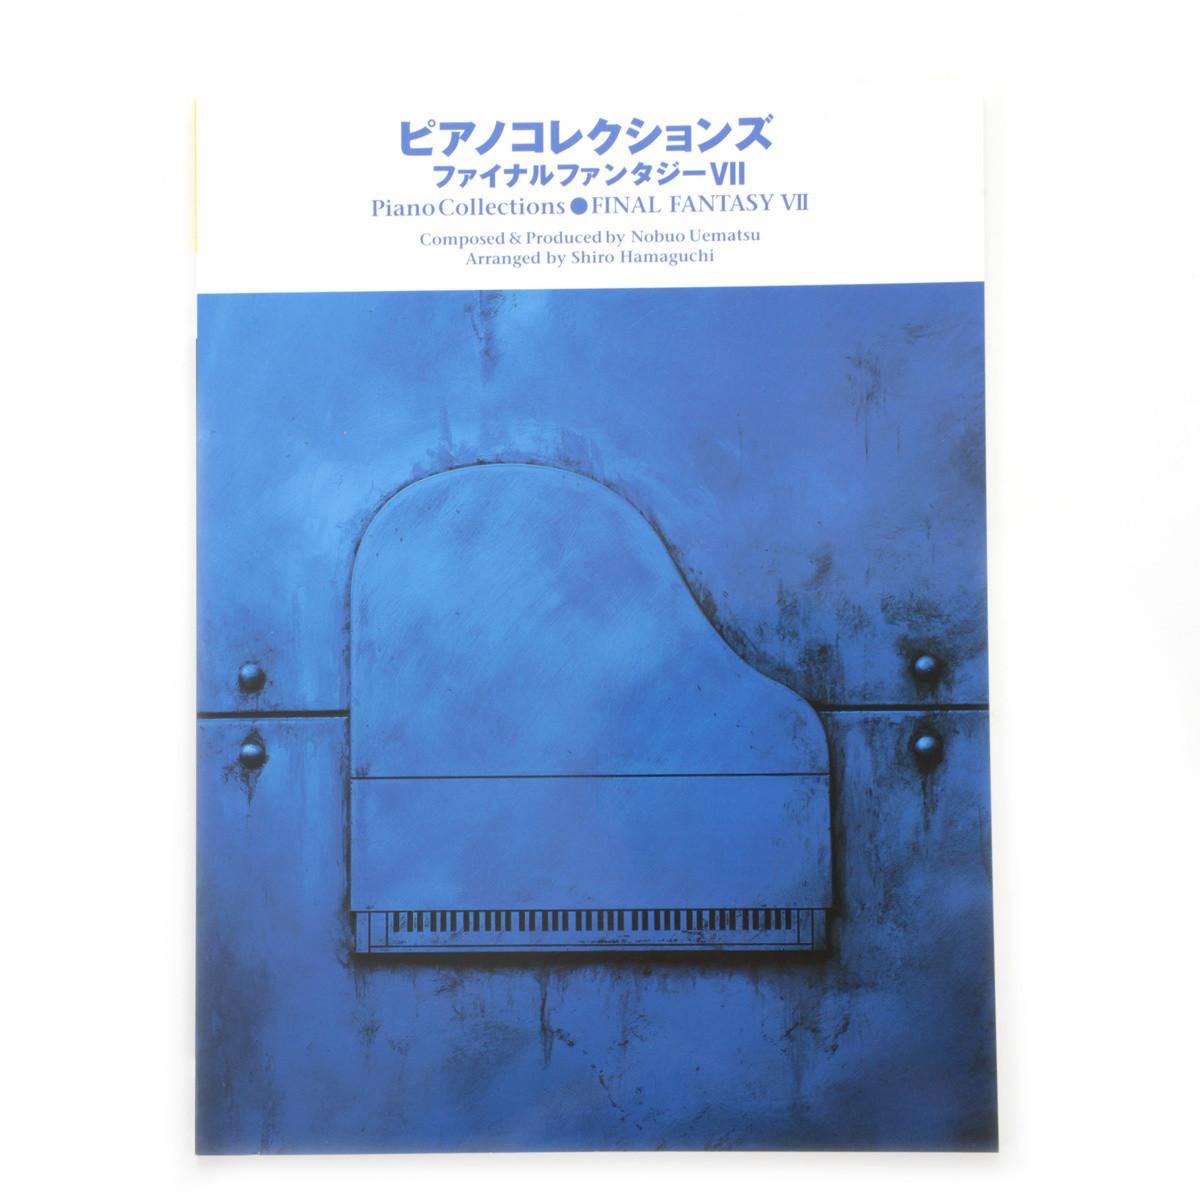 Piano Collections Final Fantasy 7 Vol. 2